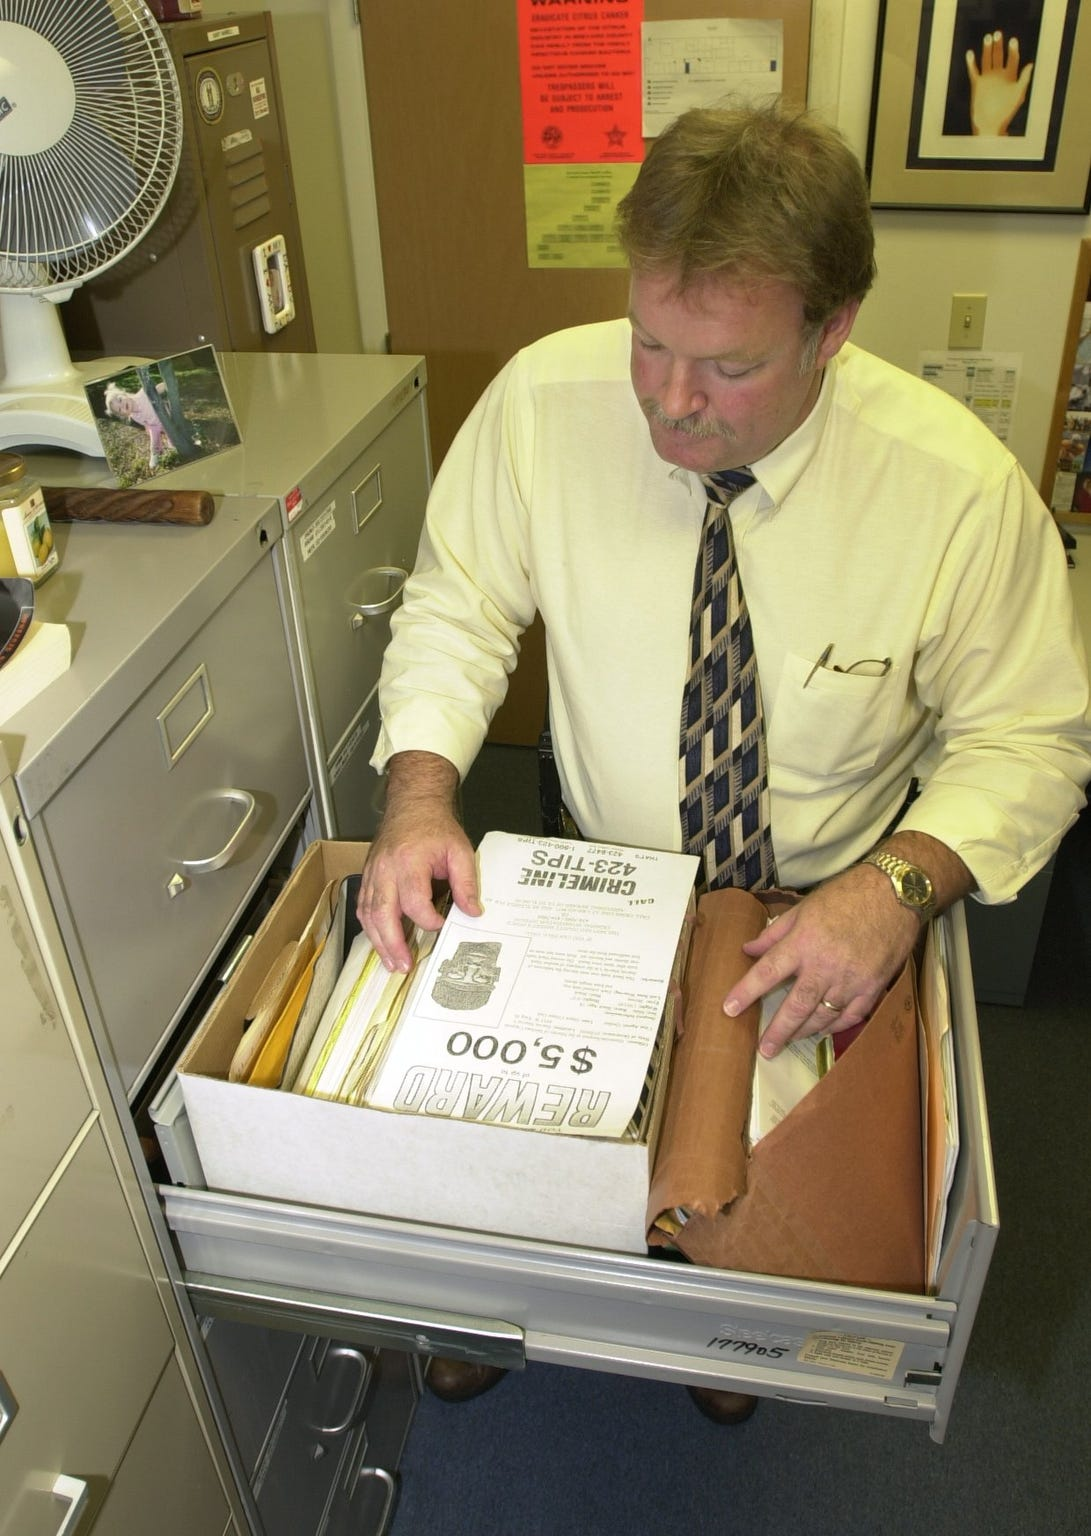 Brevard County homicide detective Gary Harrell